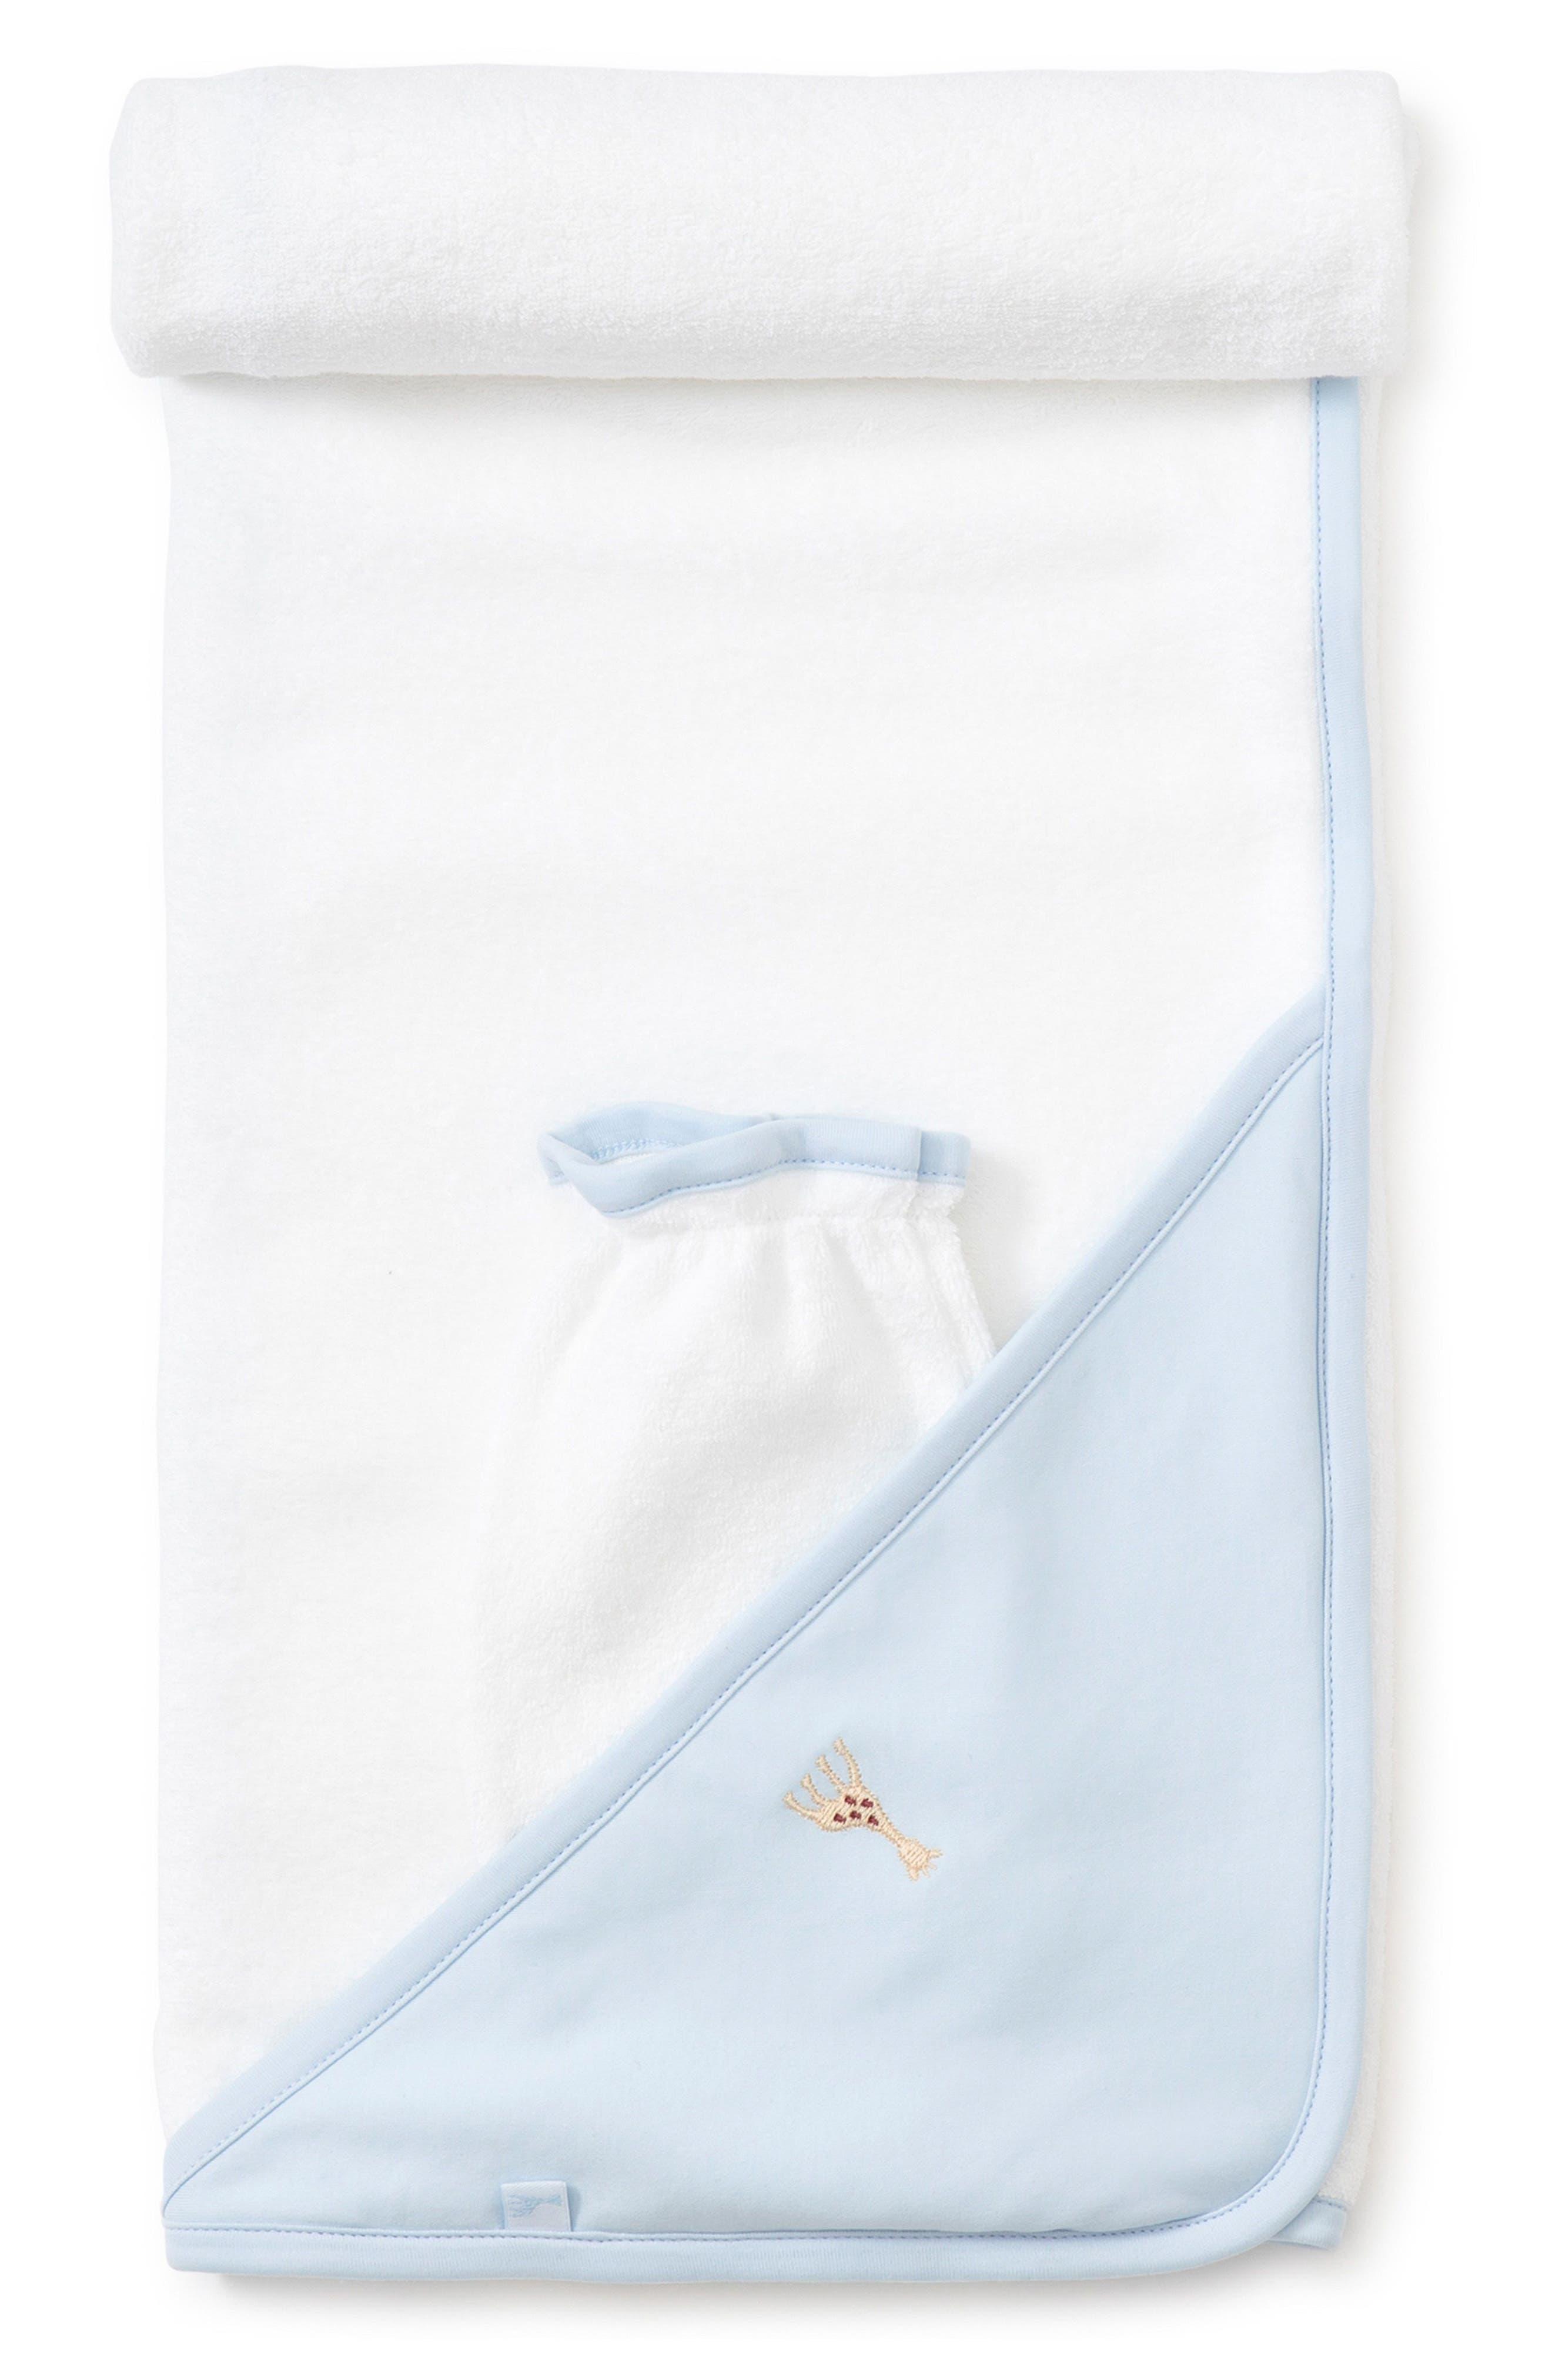 KISSY KISSY x Sophie la Girafe Hooded Towel & Bath Mitt Set, Main, color, WHITE/ LIGHT BLUE